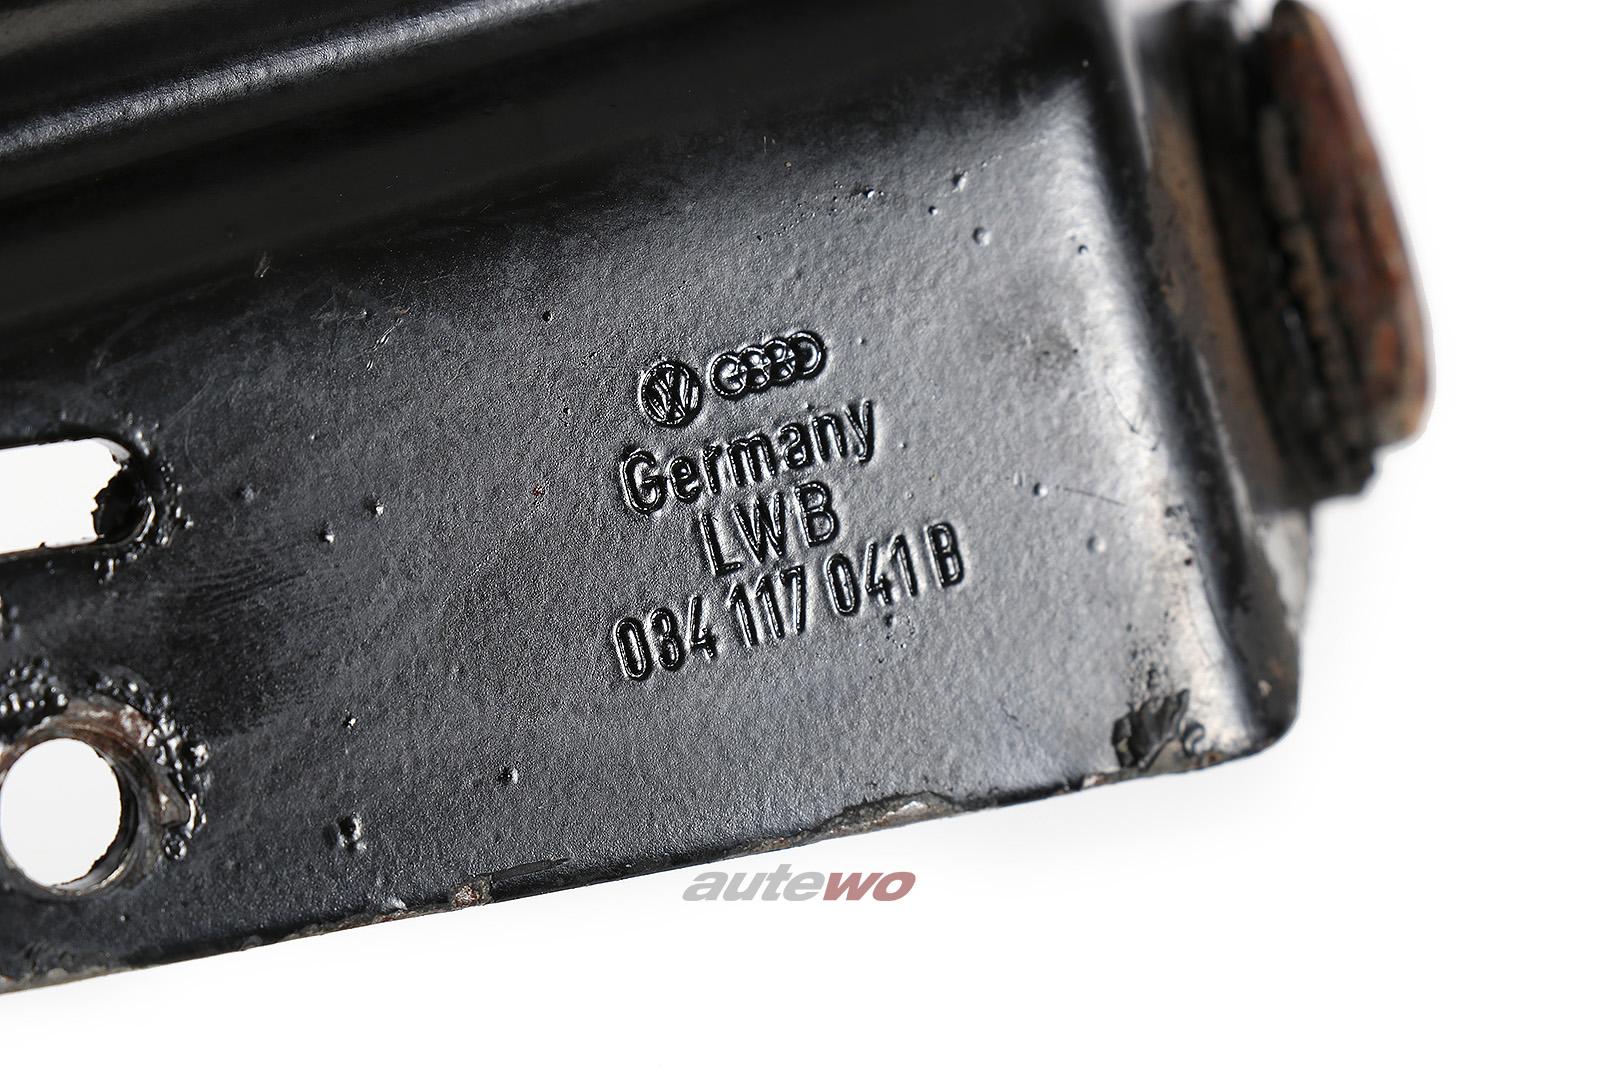 034117041B Audi S2 Coupe Typ 89/B4 2.2l Halter Ölkühler